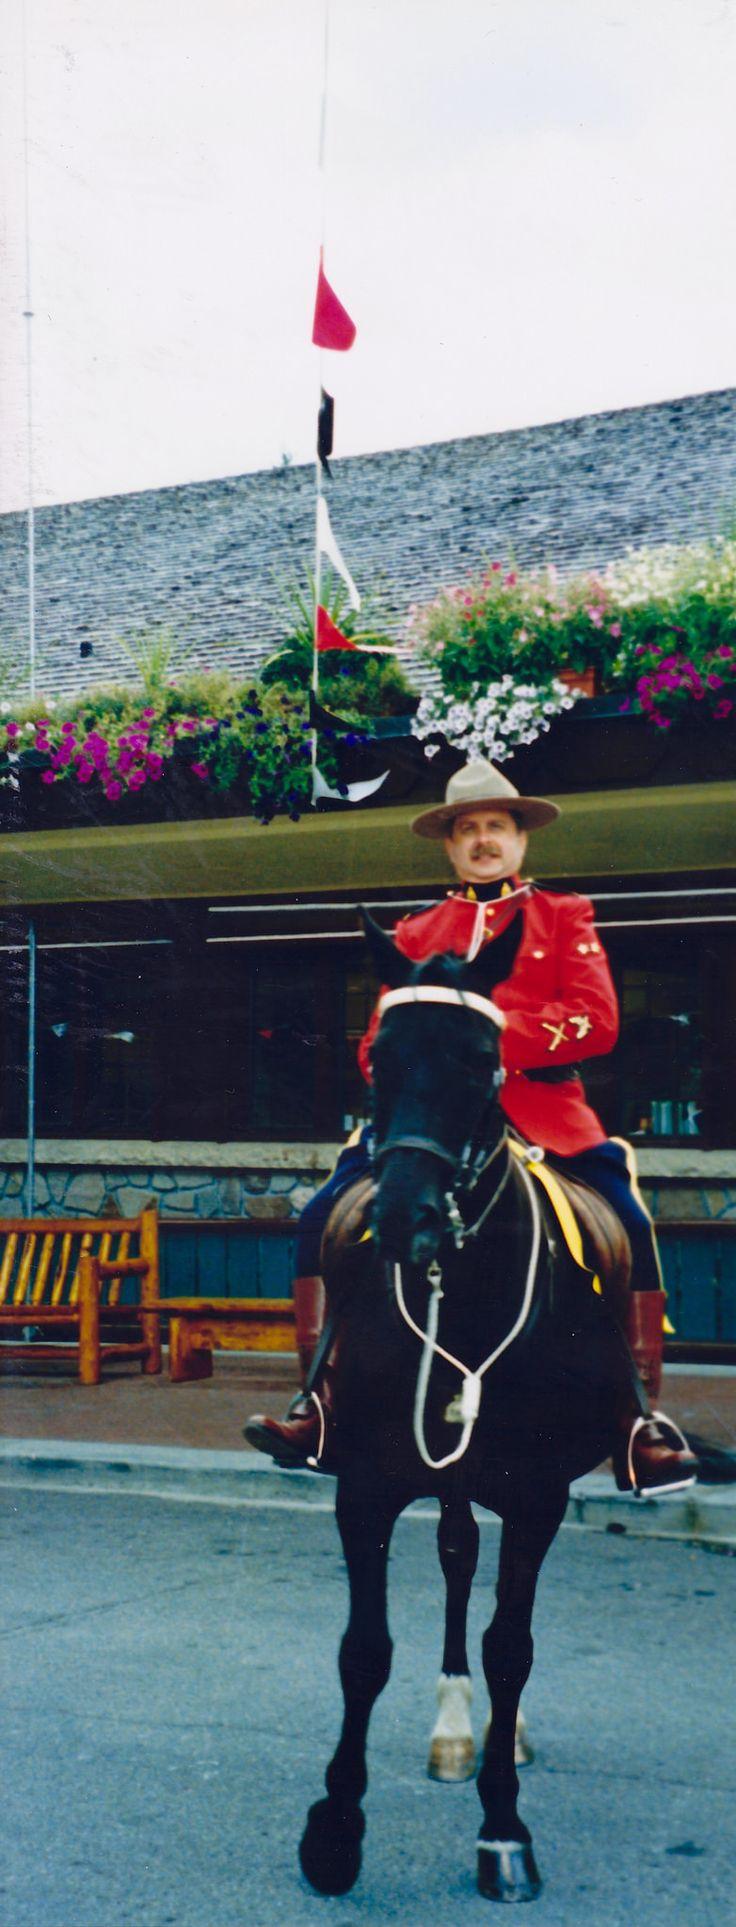 https://flic.kr/p/tsBxAz | Royal Canadian Mounted Police, Fairmont Jasper Park Lodge